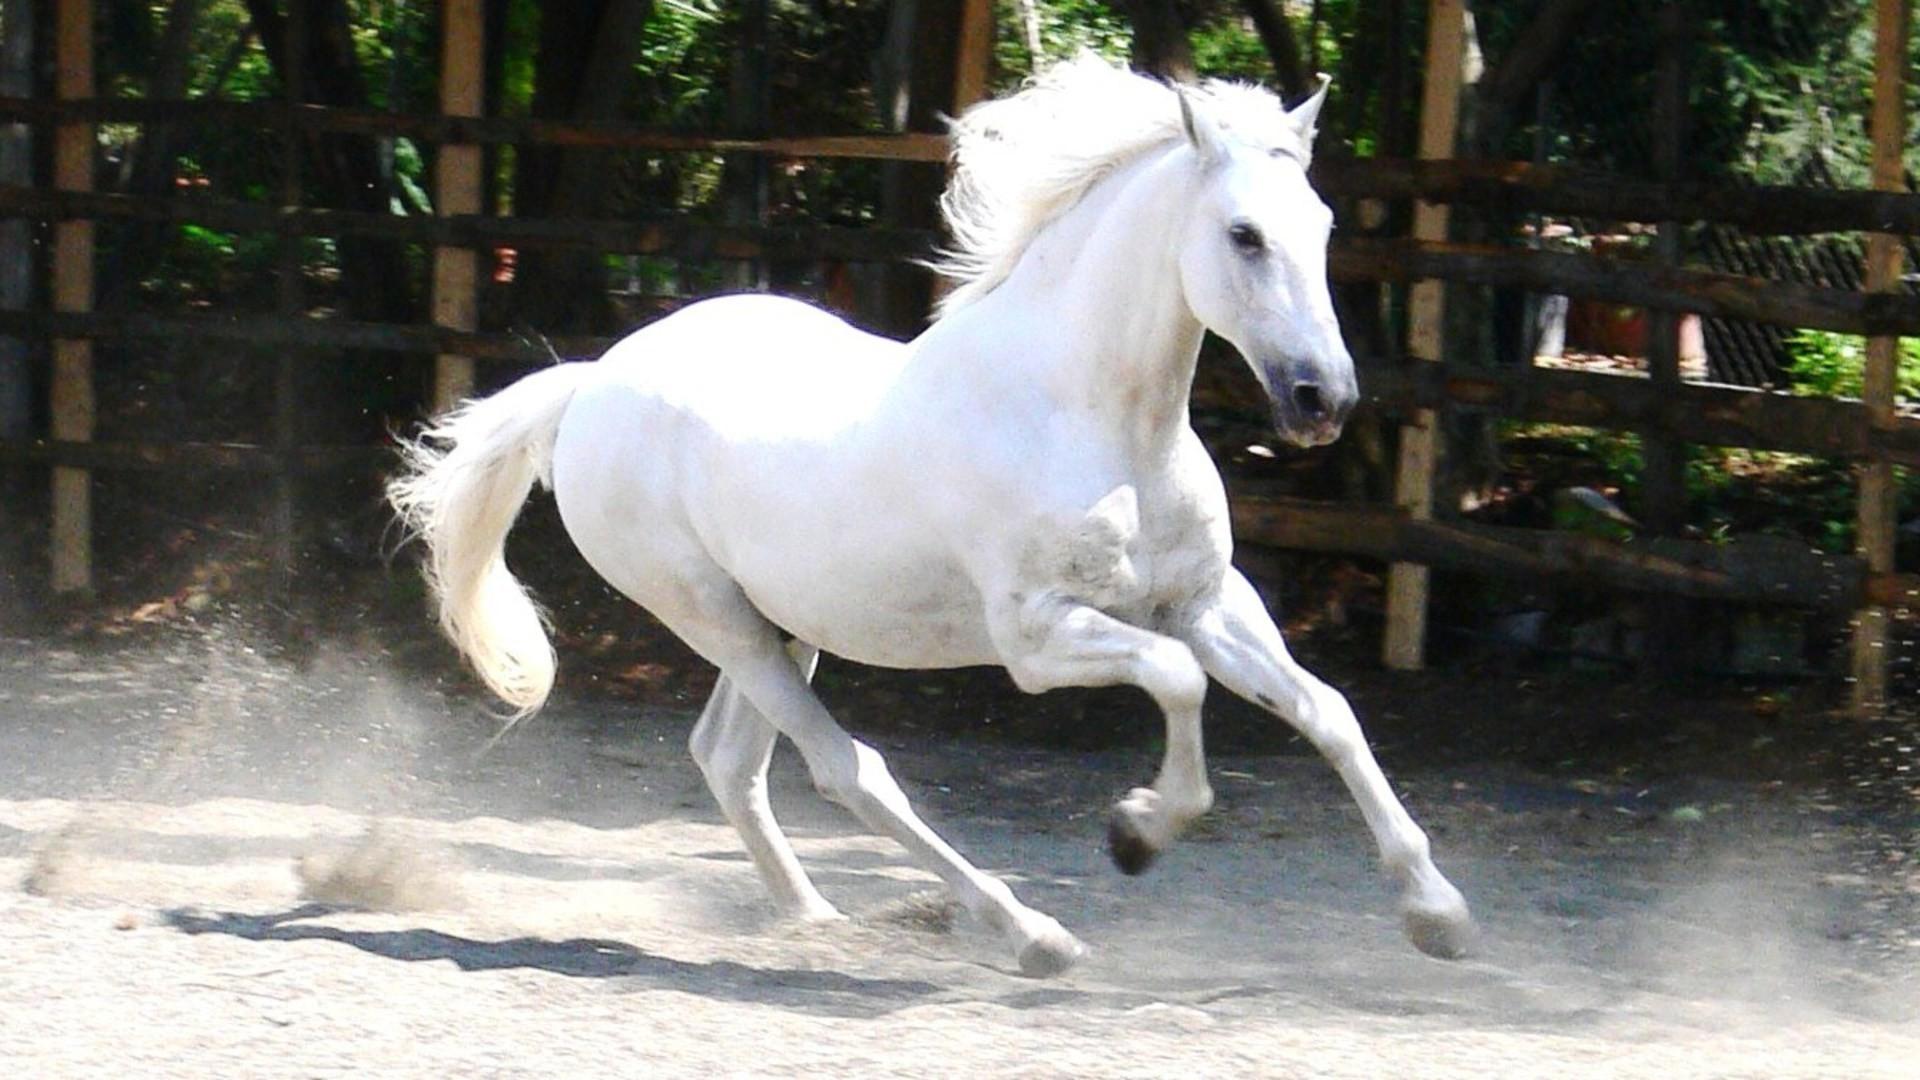 Res: 1920x1080, White Horses